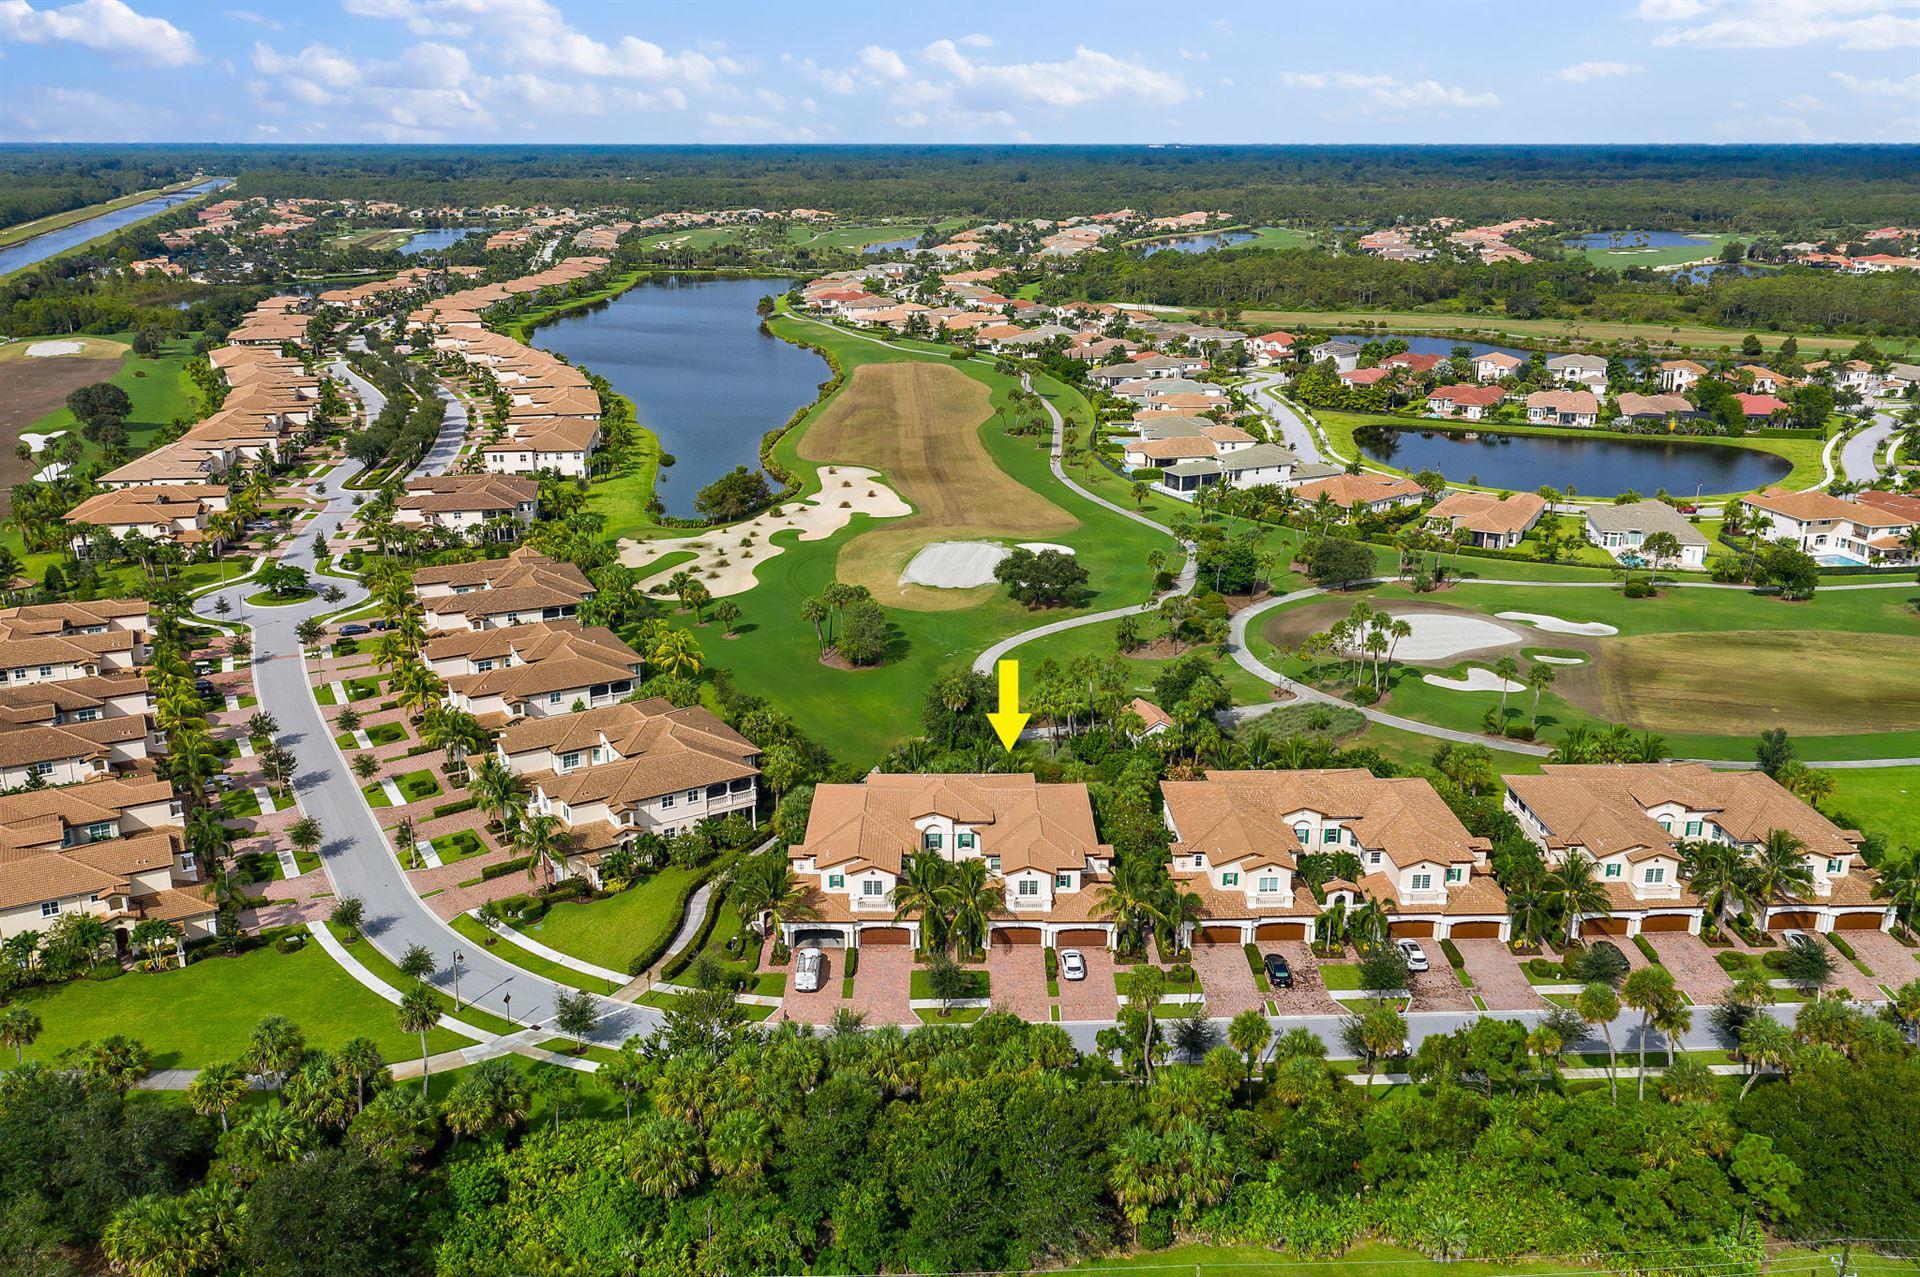 187 Tresana Boulevard #153, Jupiter, FL 33478 - #: RX-10649433